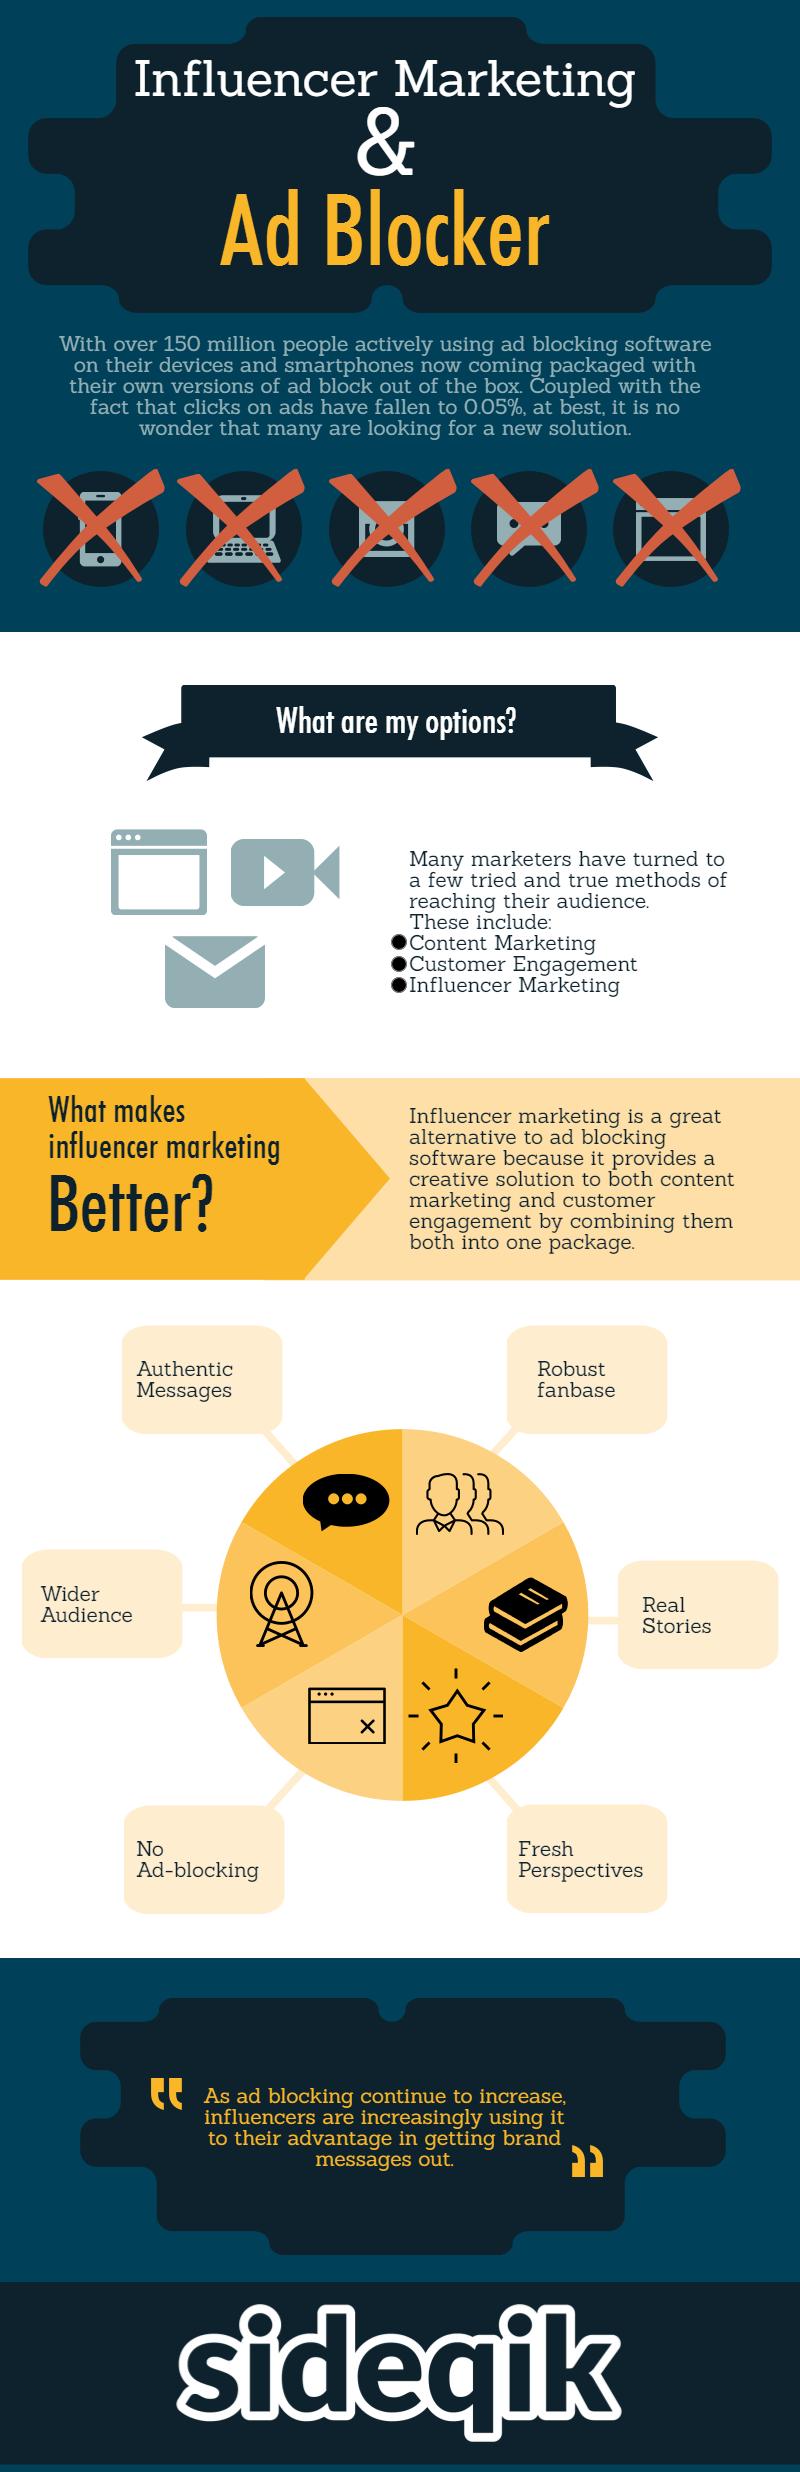 influencer marketing and ad blocker